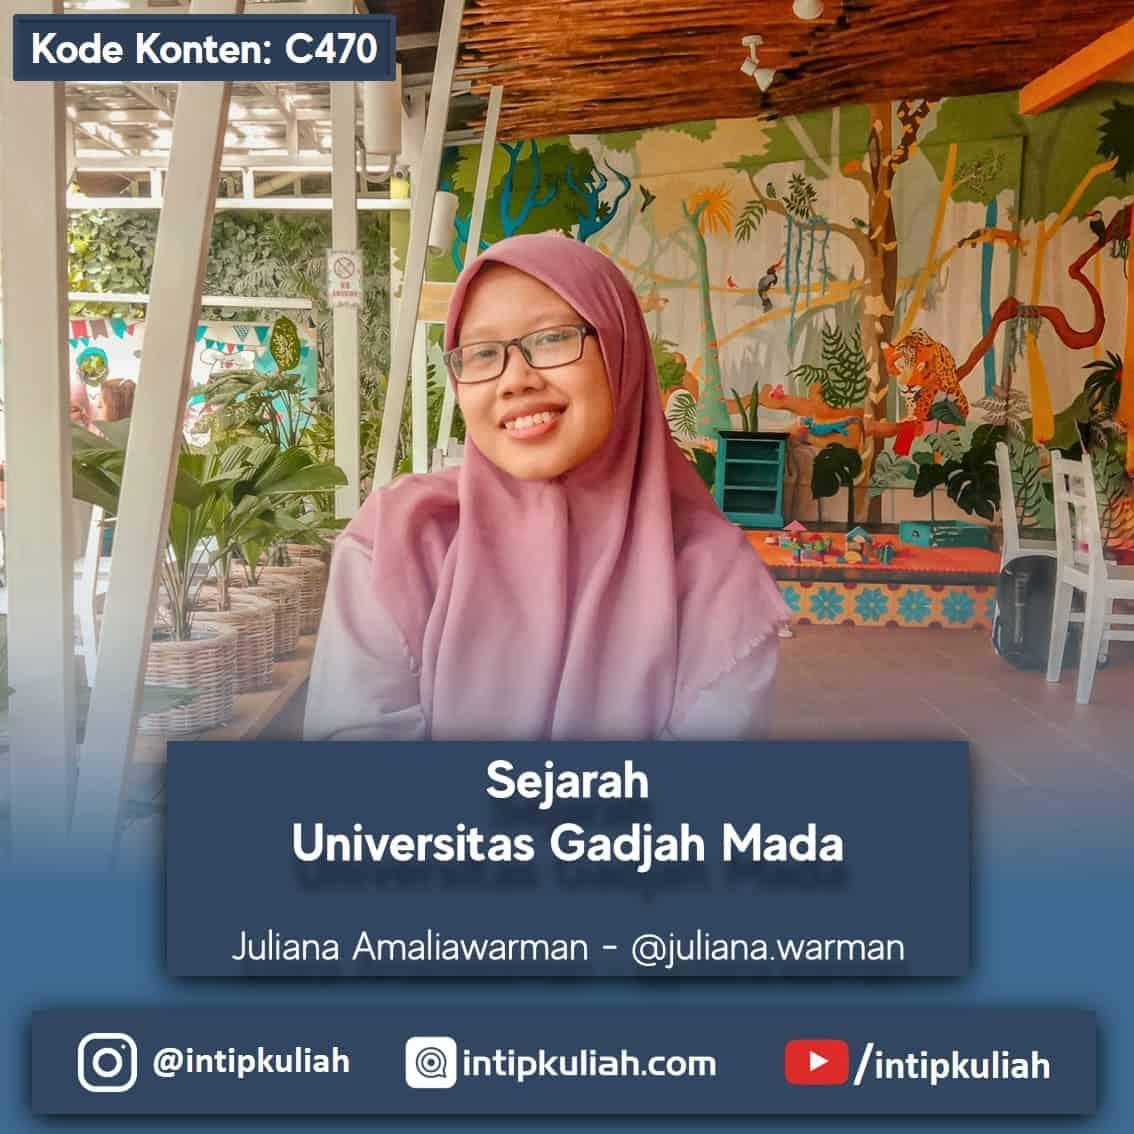 Sejarah Universitas Gadjah Mada (Juliana)